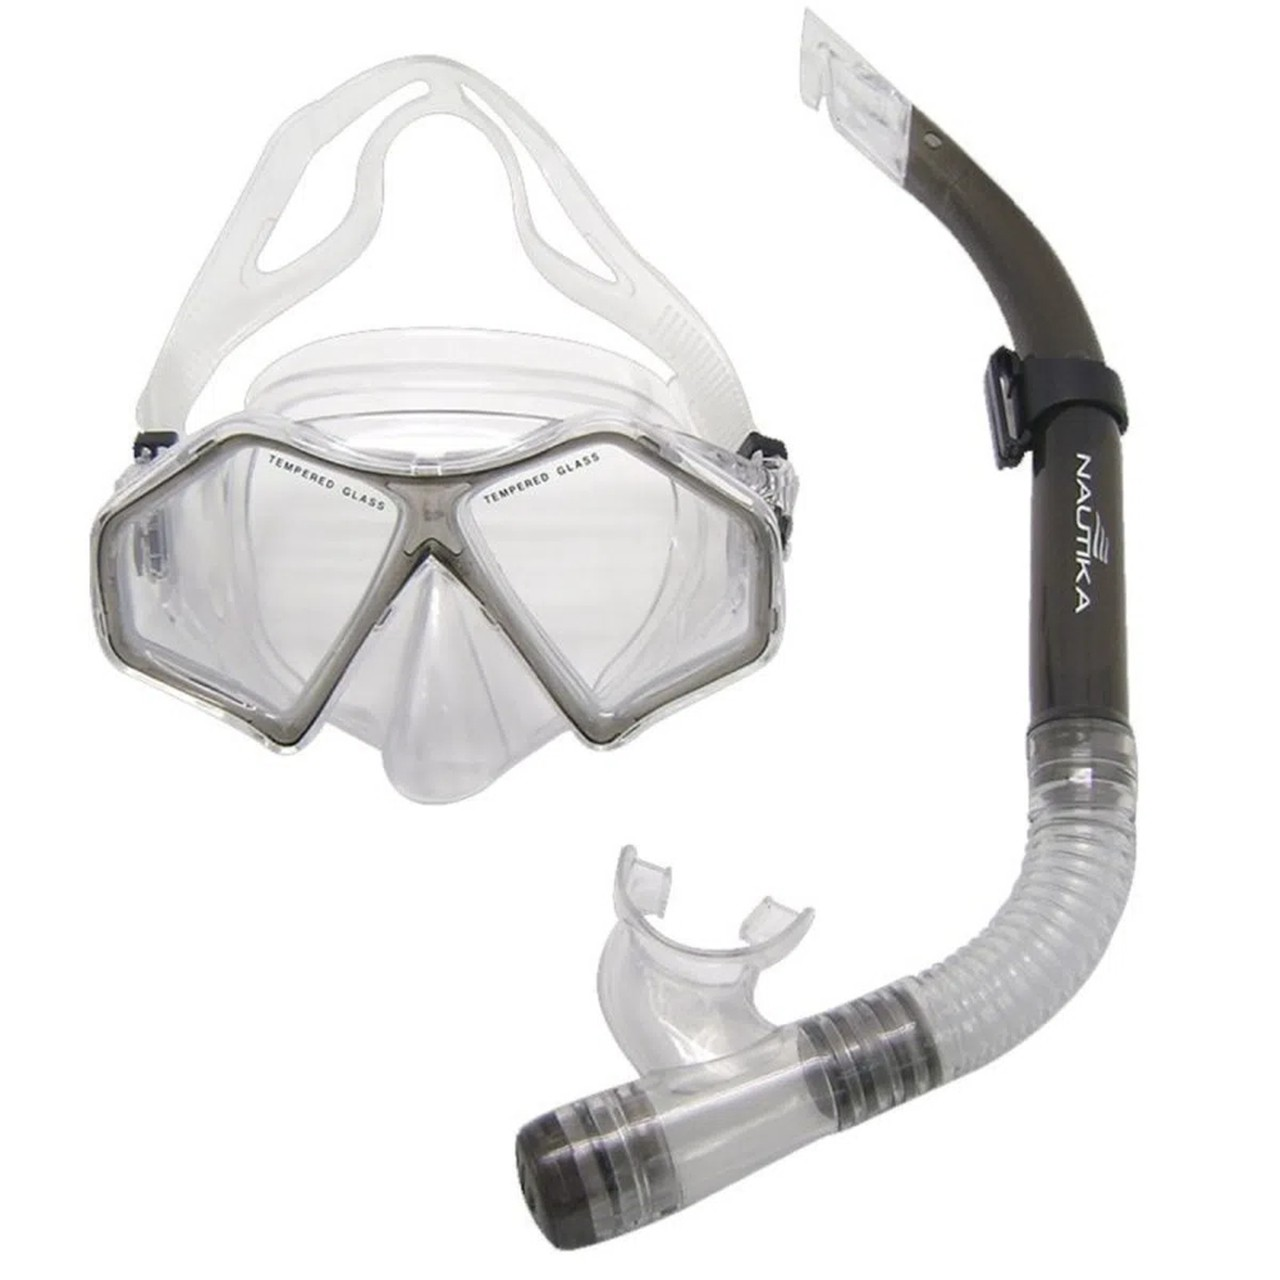 Kit de snorkel para mergulho preto - SPIDER